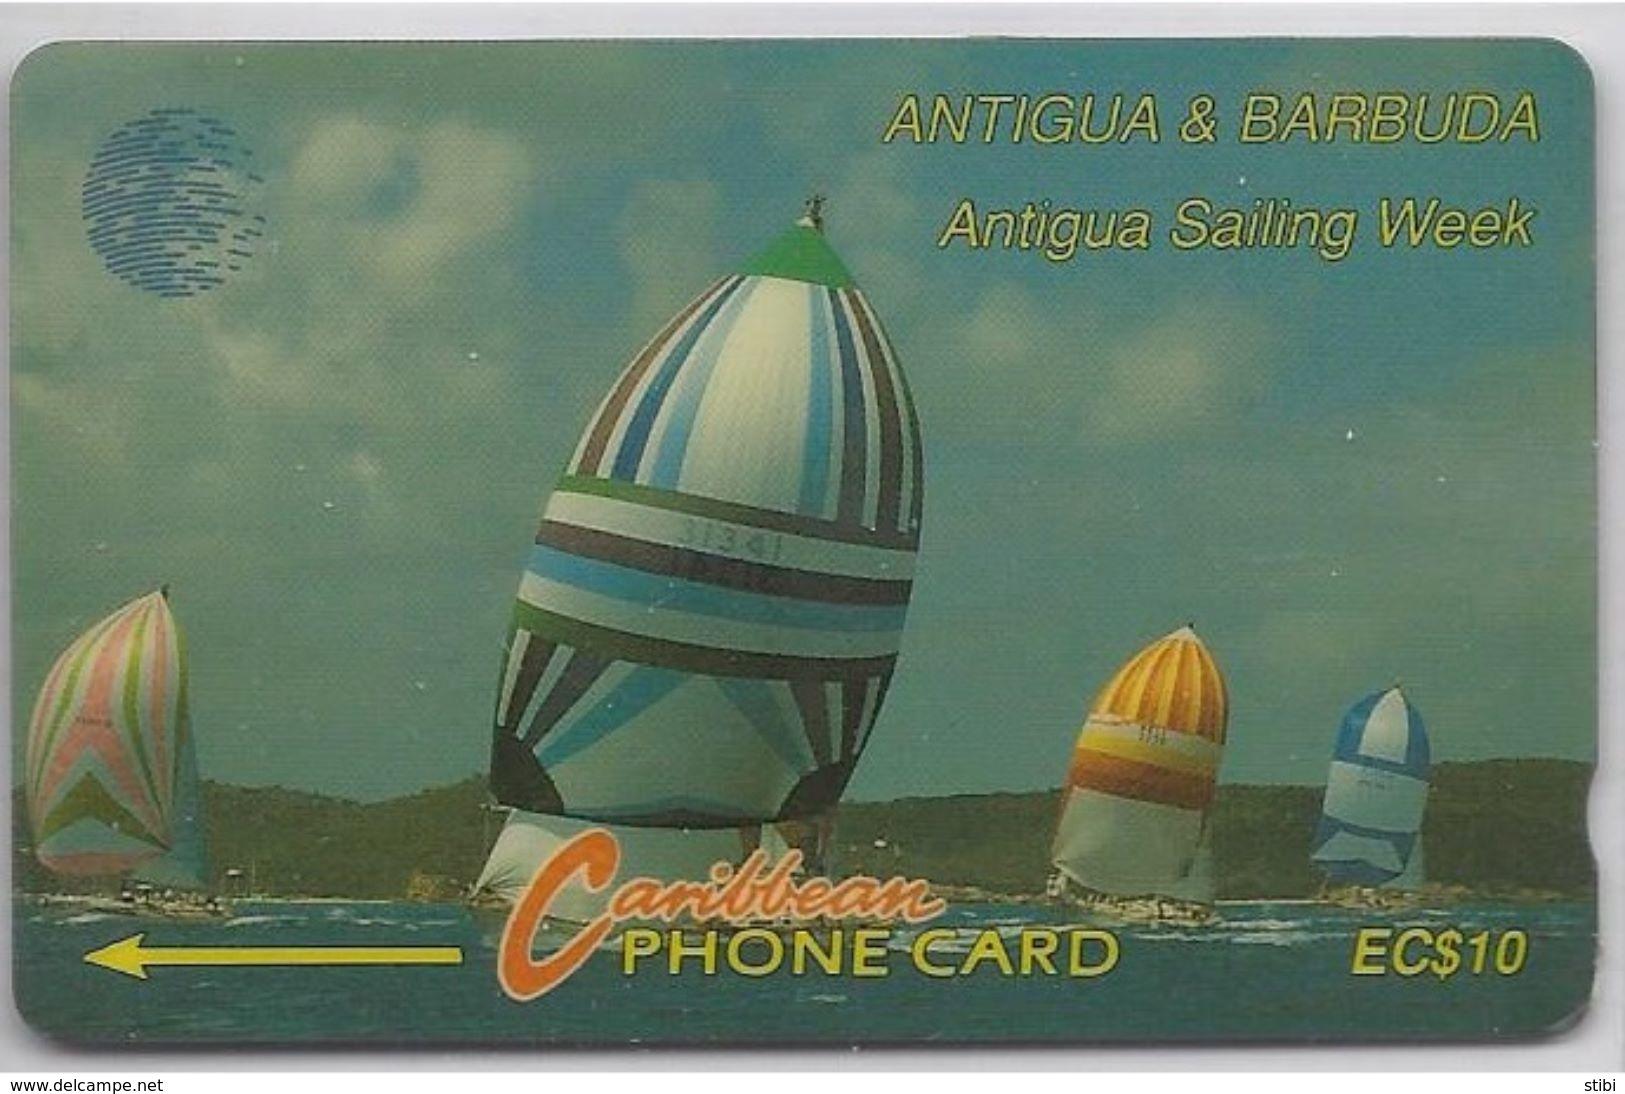 ANTIGUA & BARBUDA - ANTIGUA SAILING WEEK - 13CATA - - Antigua And Barbuda